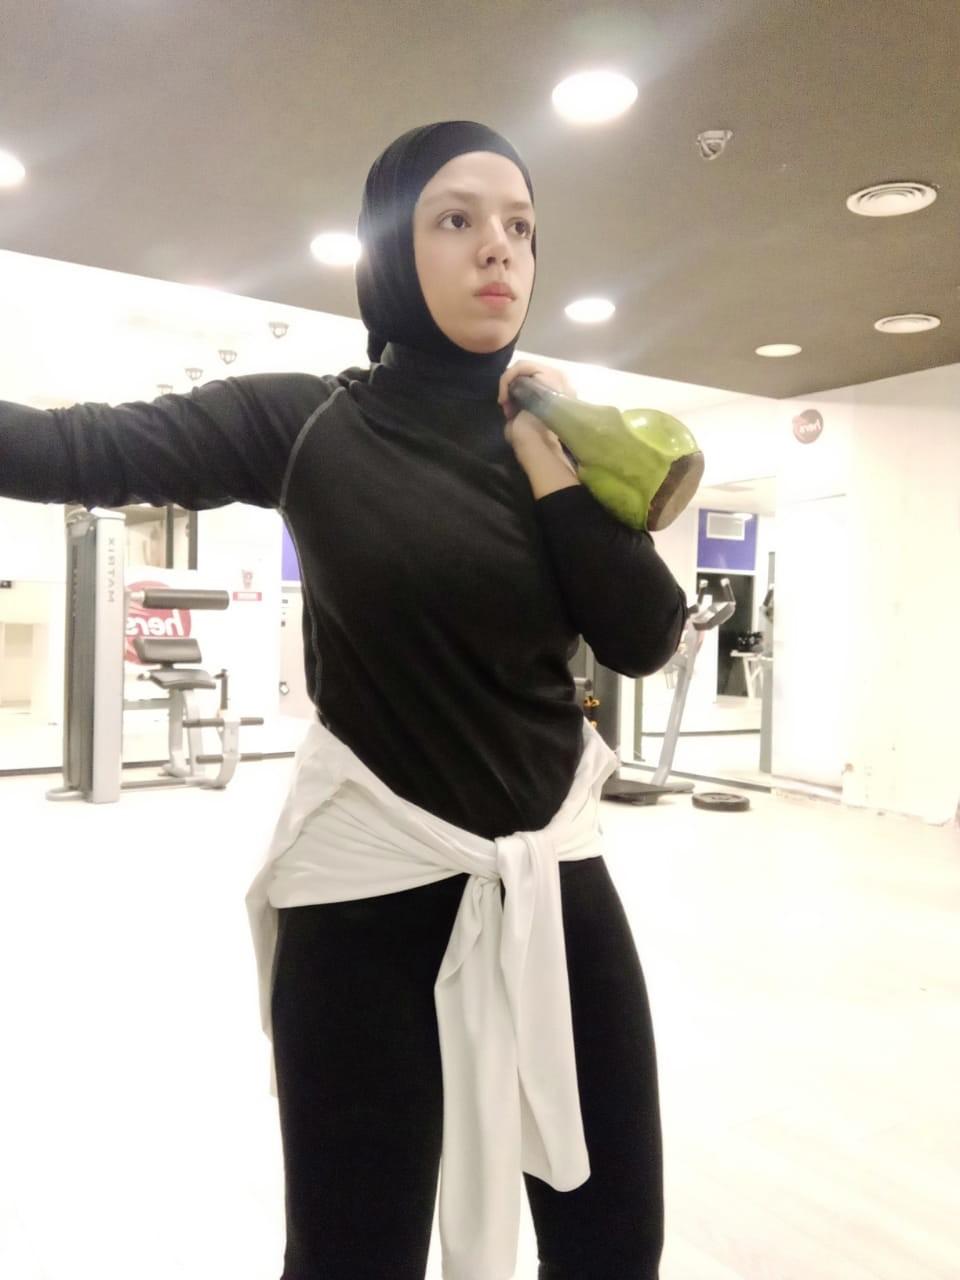 Aya Mohsen